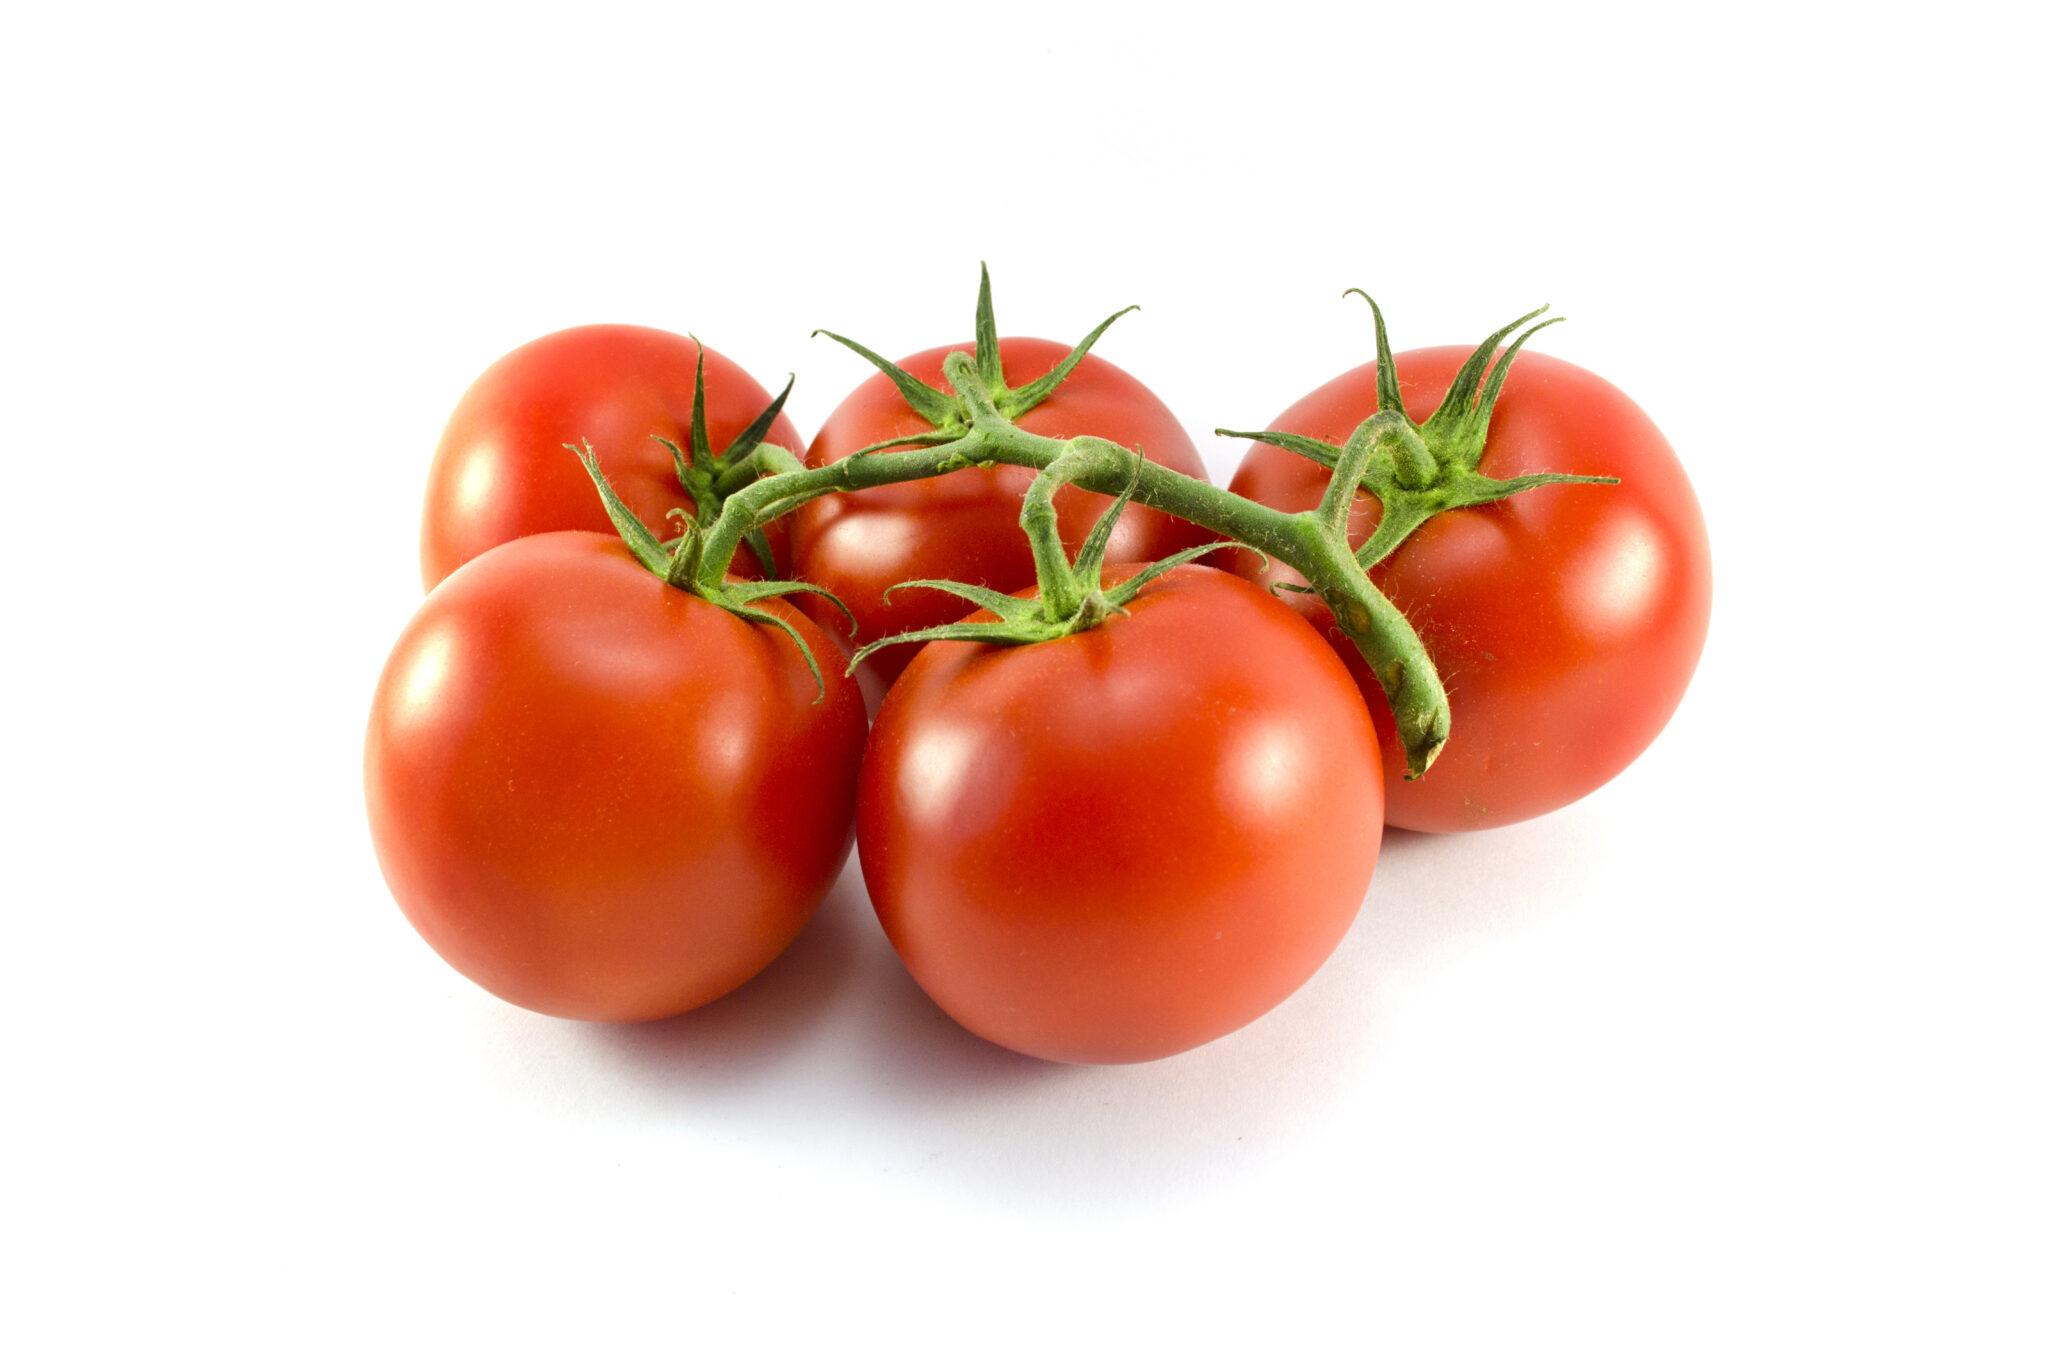 Tomatoes_(copy_1)